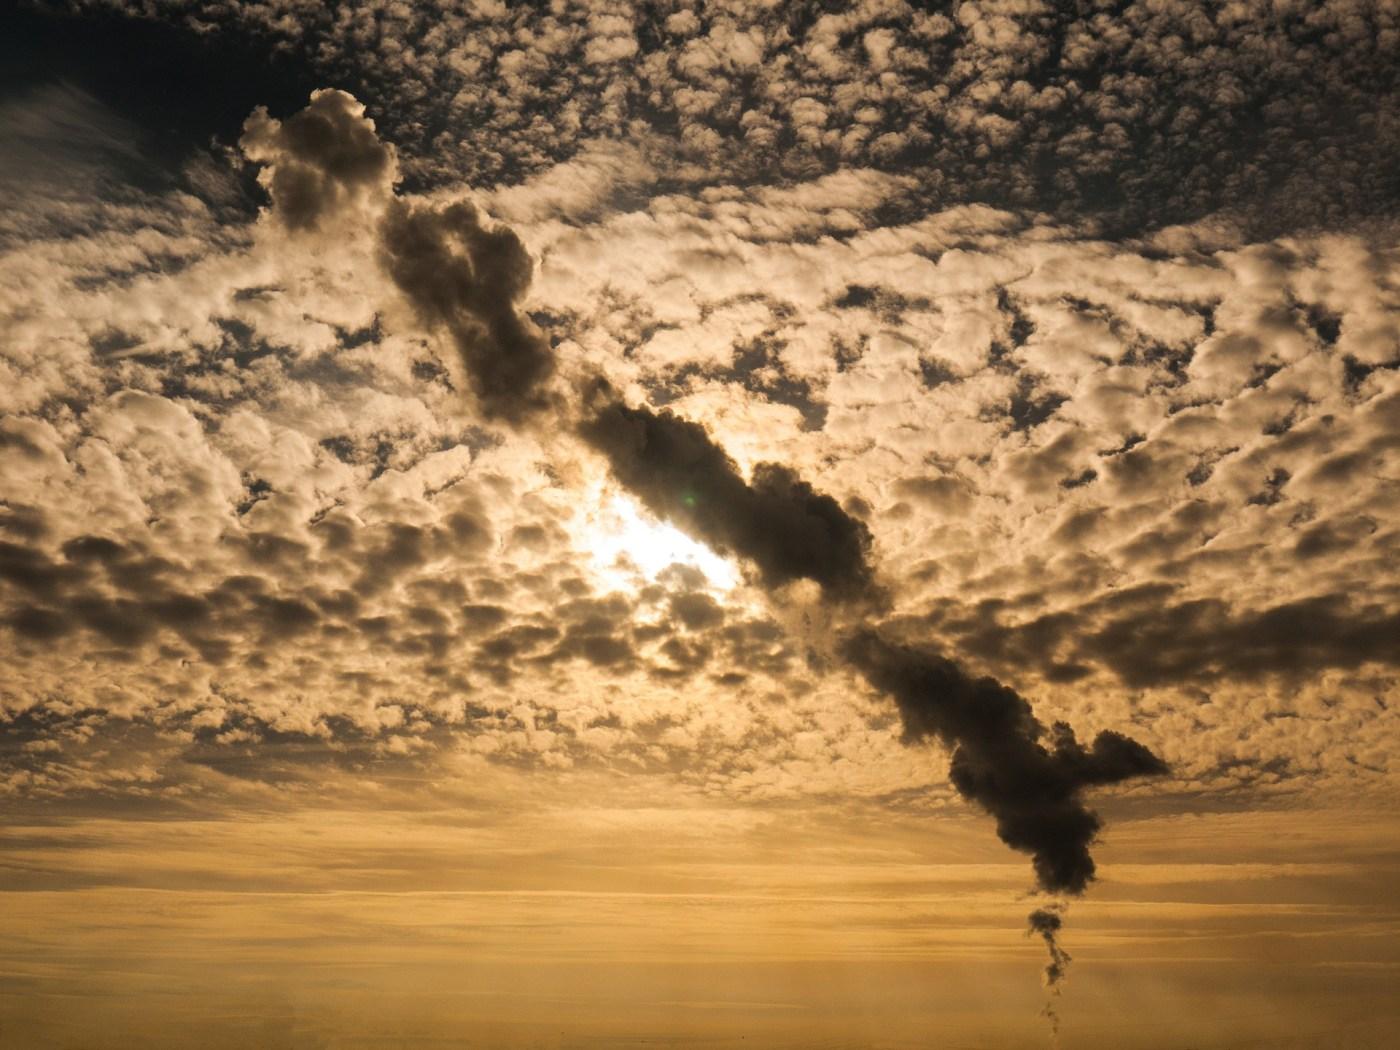 Sky with smoke